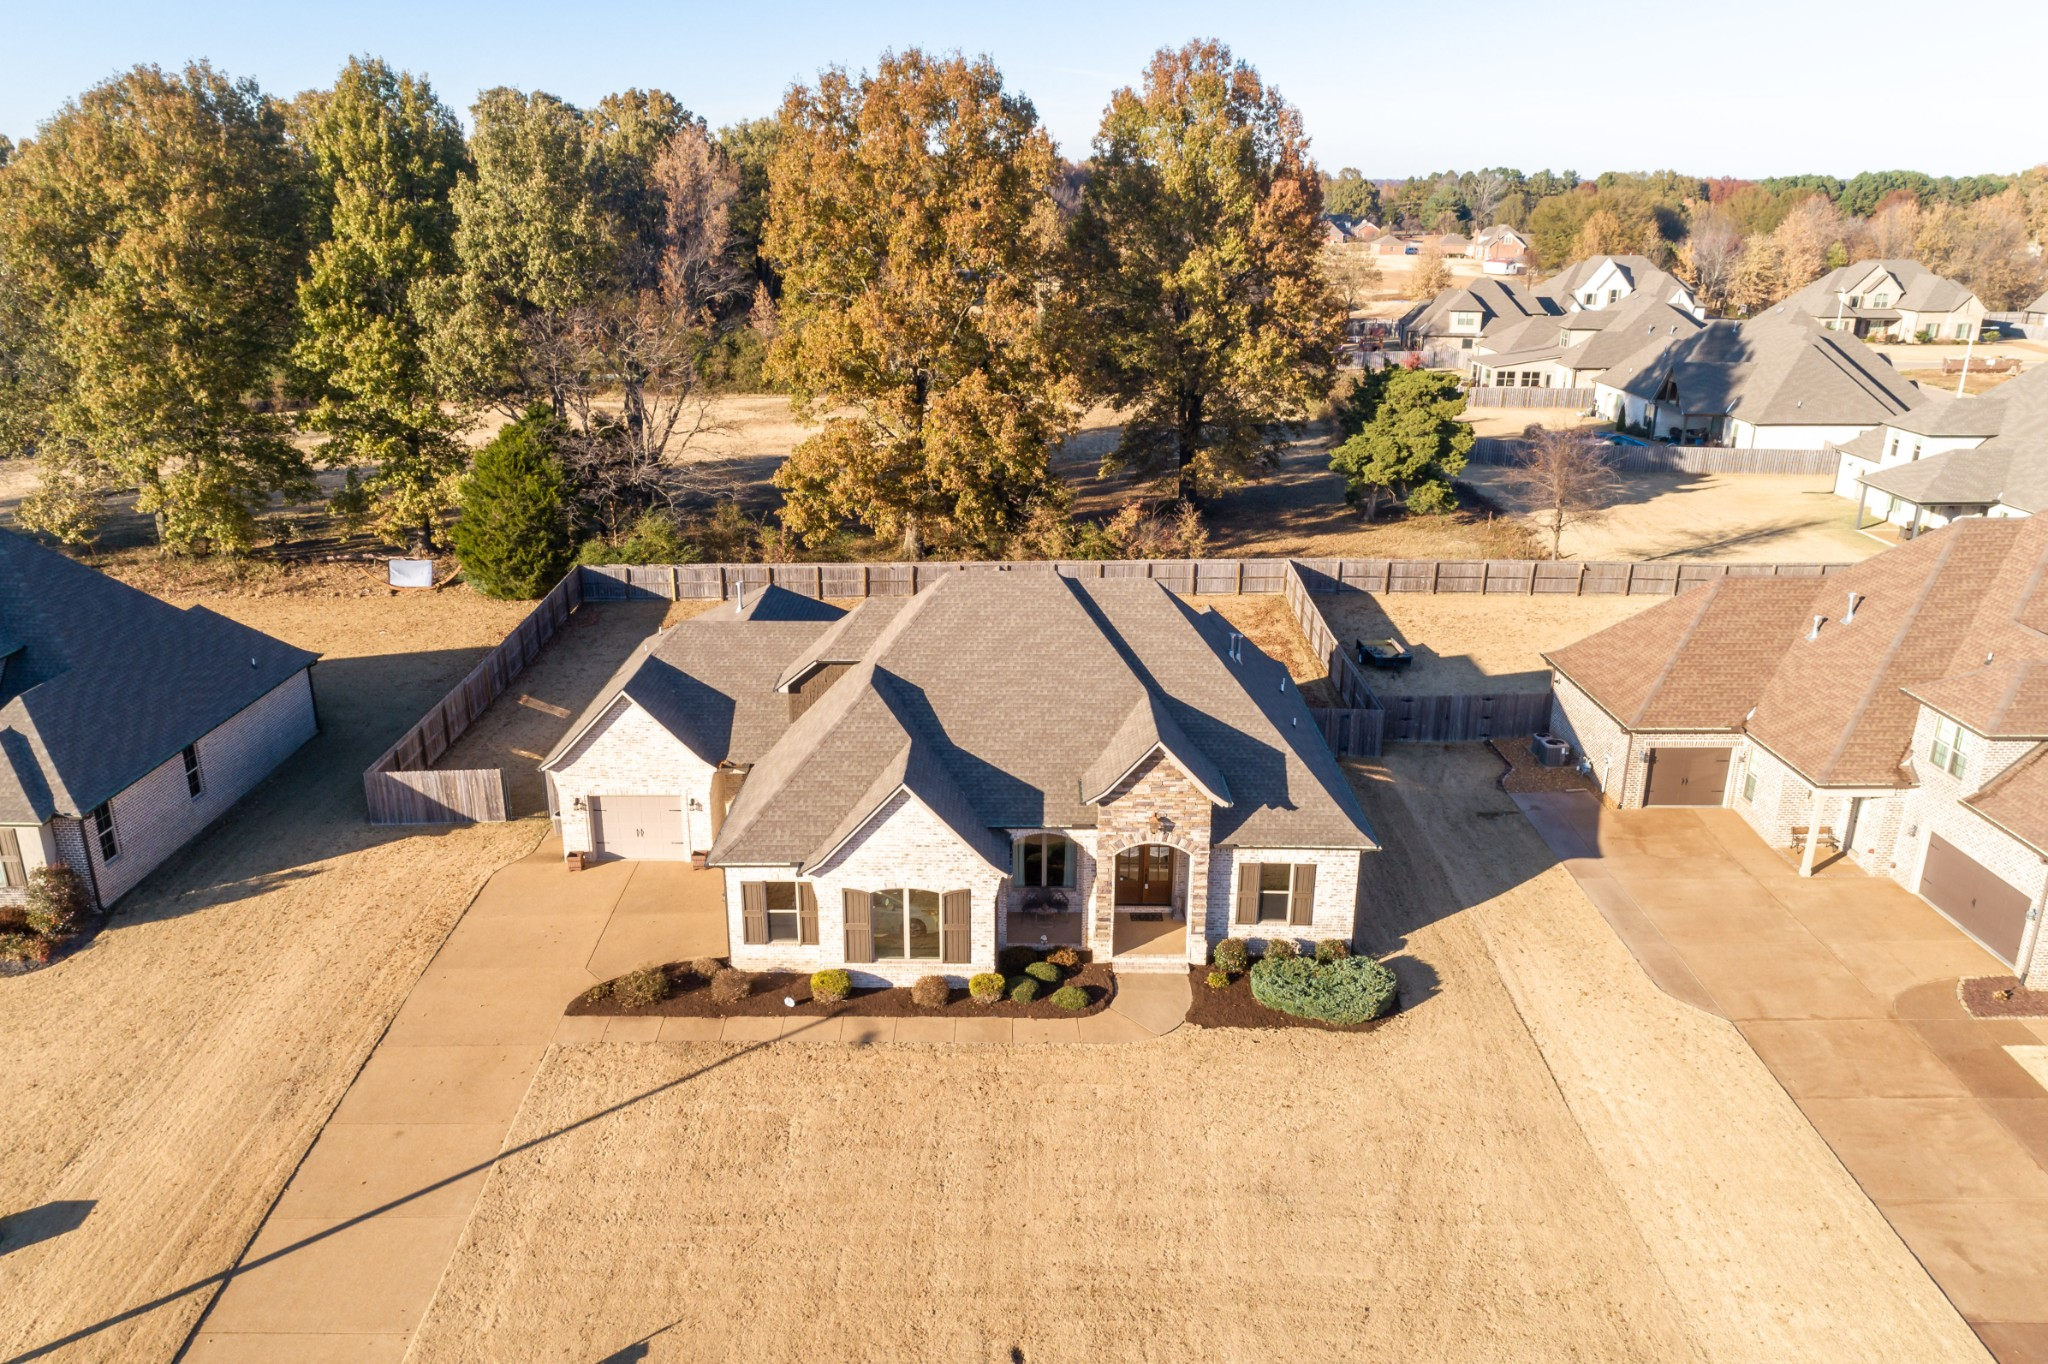 25 Cheddleton Dr, Jackson, TN 38305 - Jackson, TN real estate listing